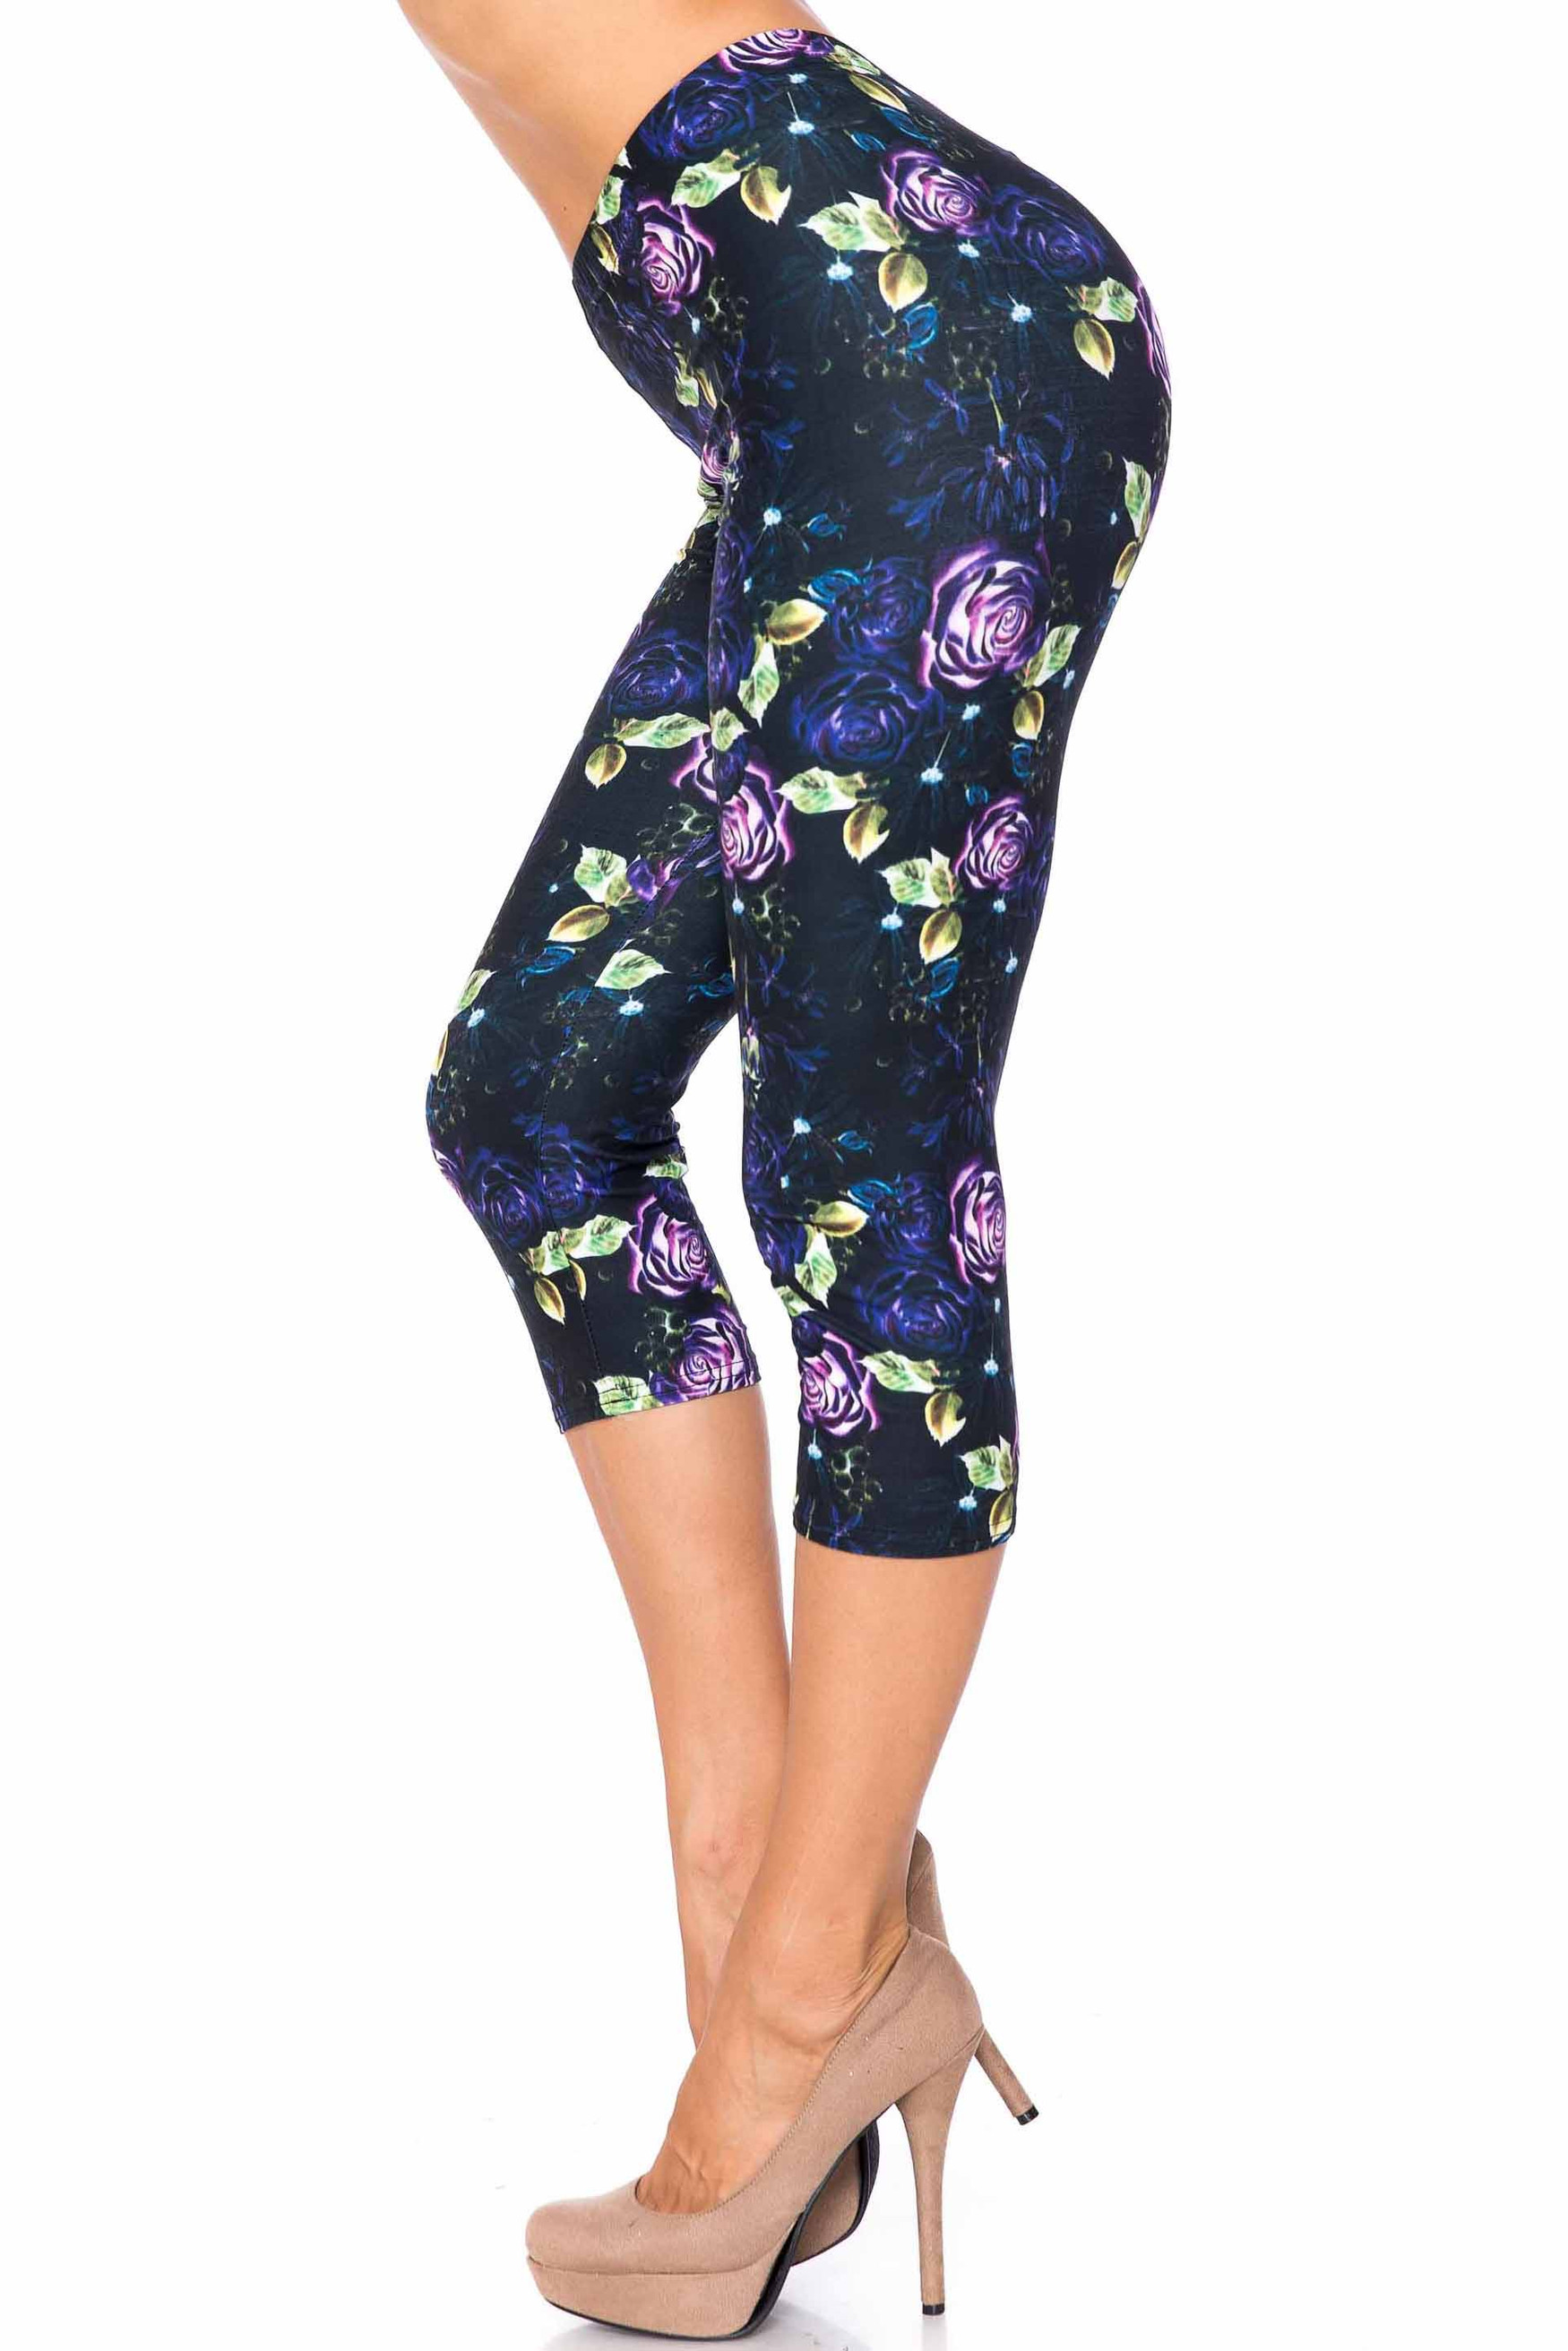 Creamy Soft Purple and Violet Rose Extra Plus Size Capris - 3X-5X - USA Fashion™